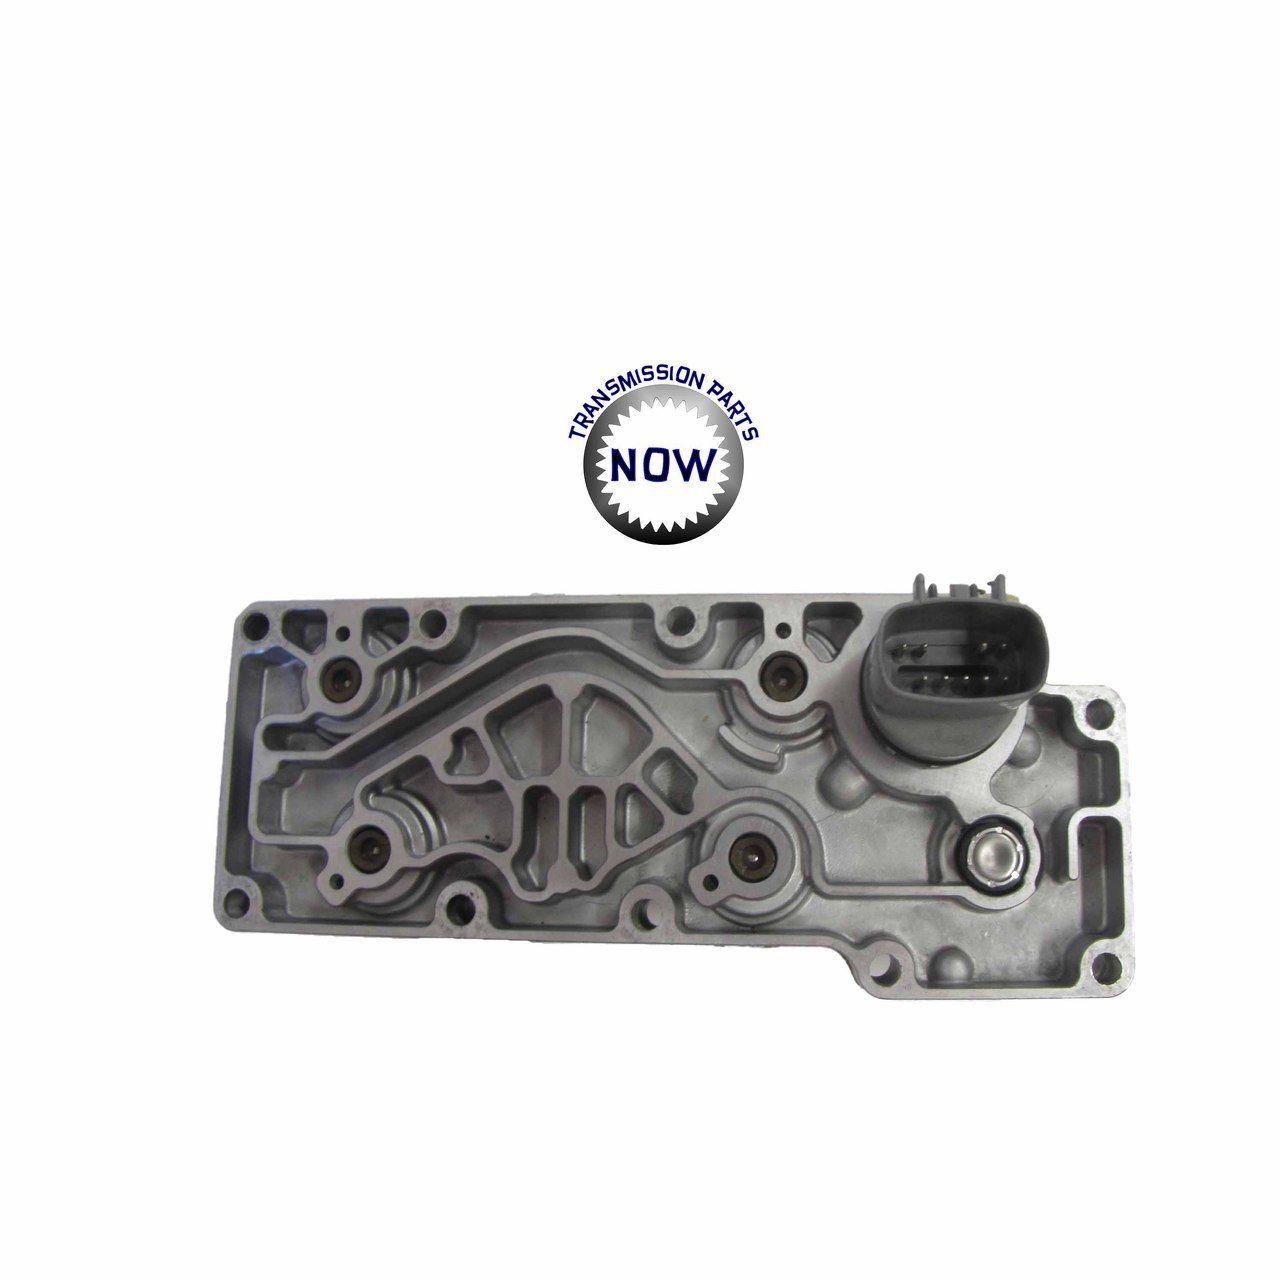 Buy quality Ford E4OD 4R100 transmission rebuilt solenoid